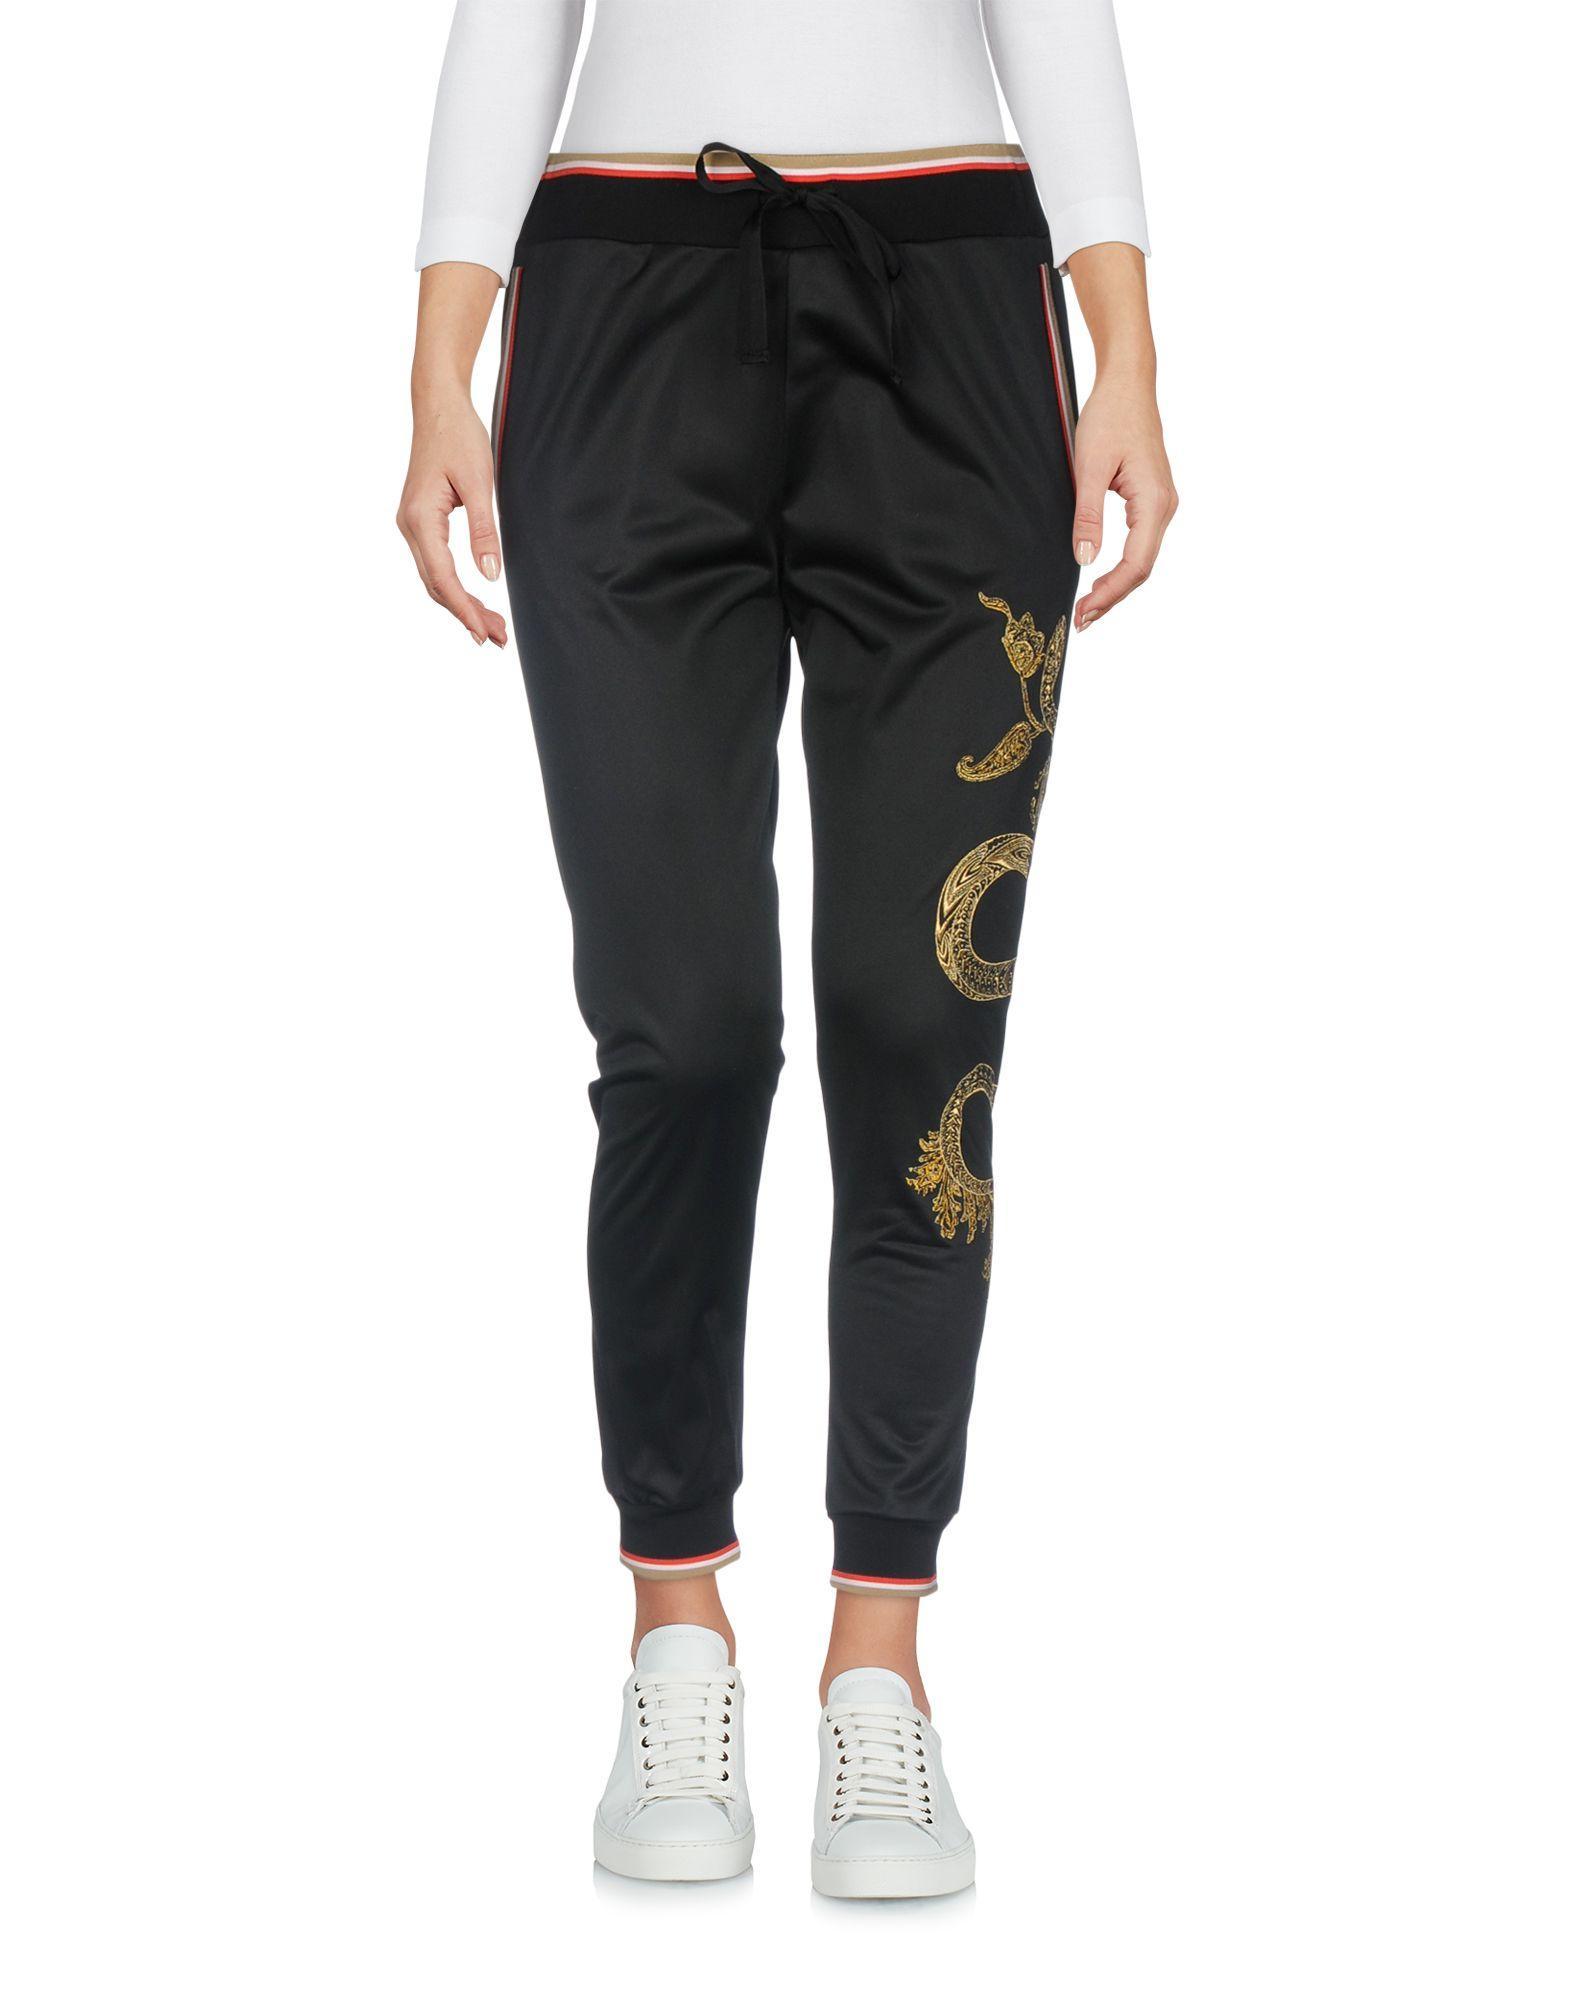 Roberto Cavalli Gym Casual Pants In Black